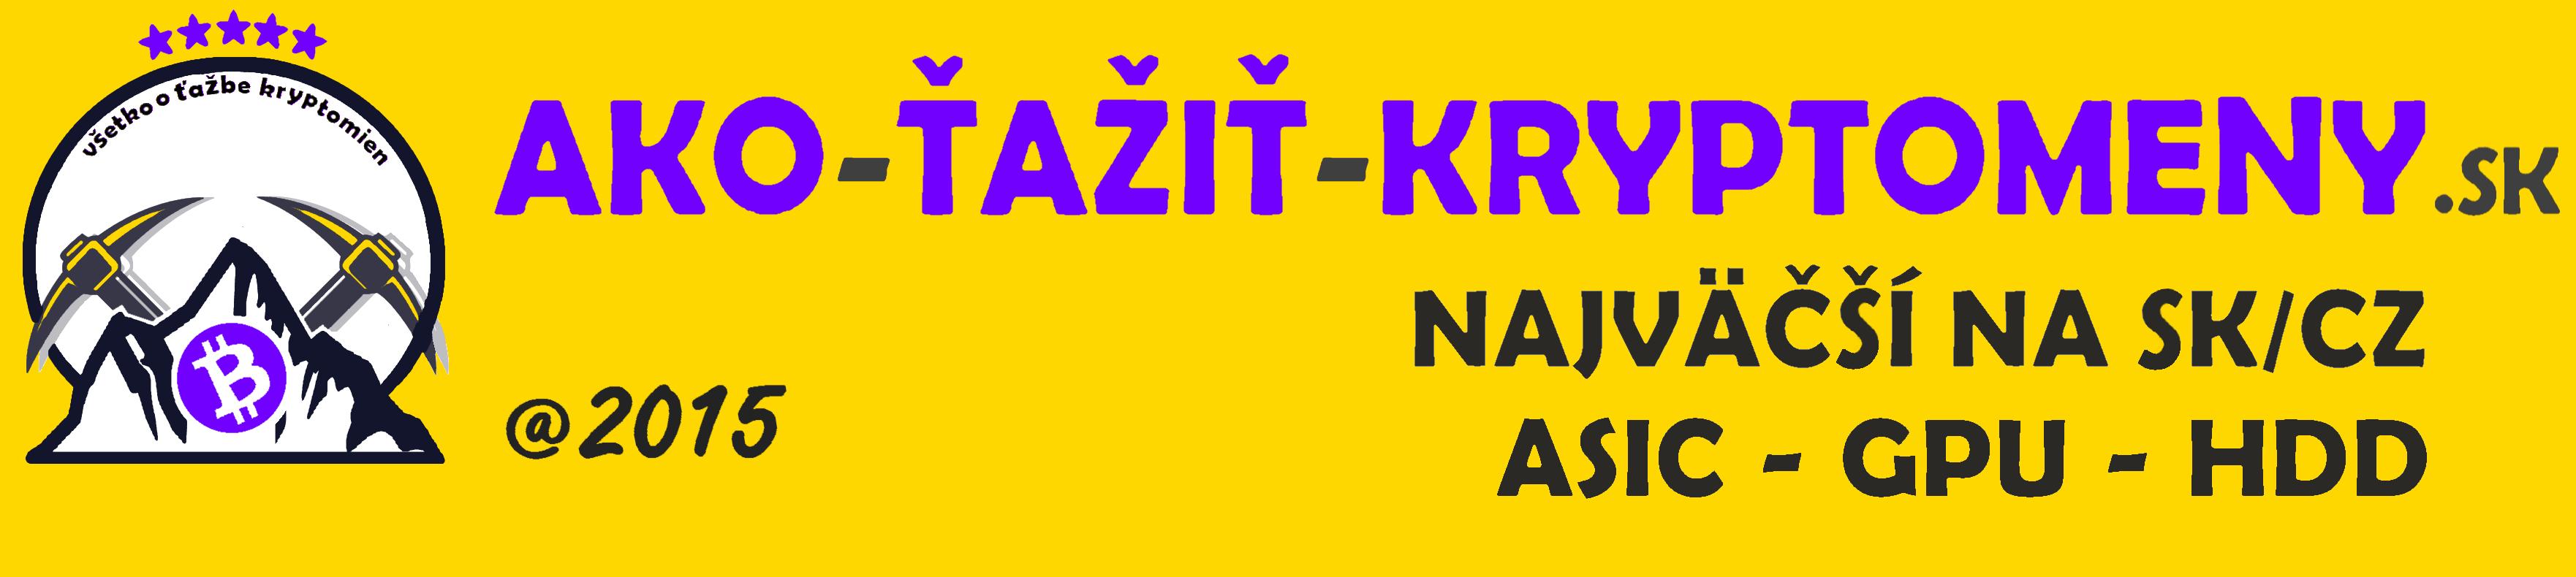 Ako-tazit-kryptomeny.sk Všetko o ťažbe LogoAMP-9.2020-Z1